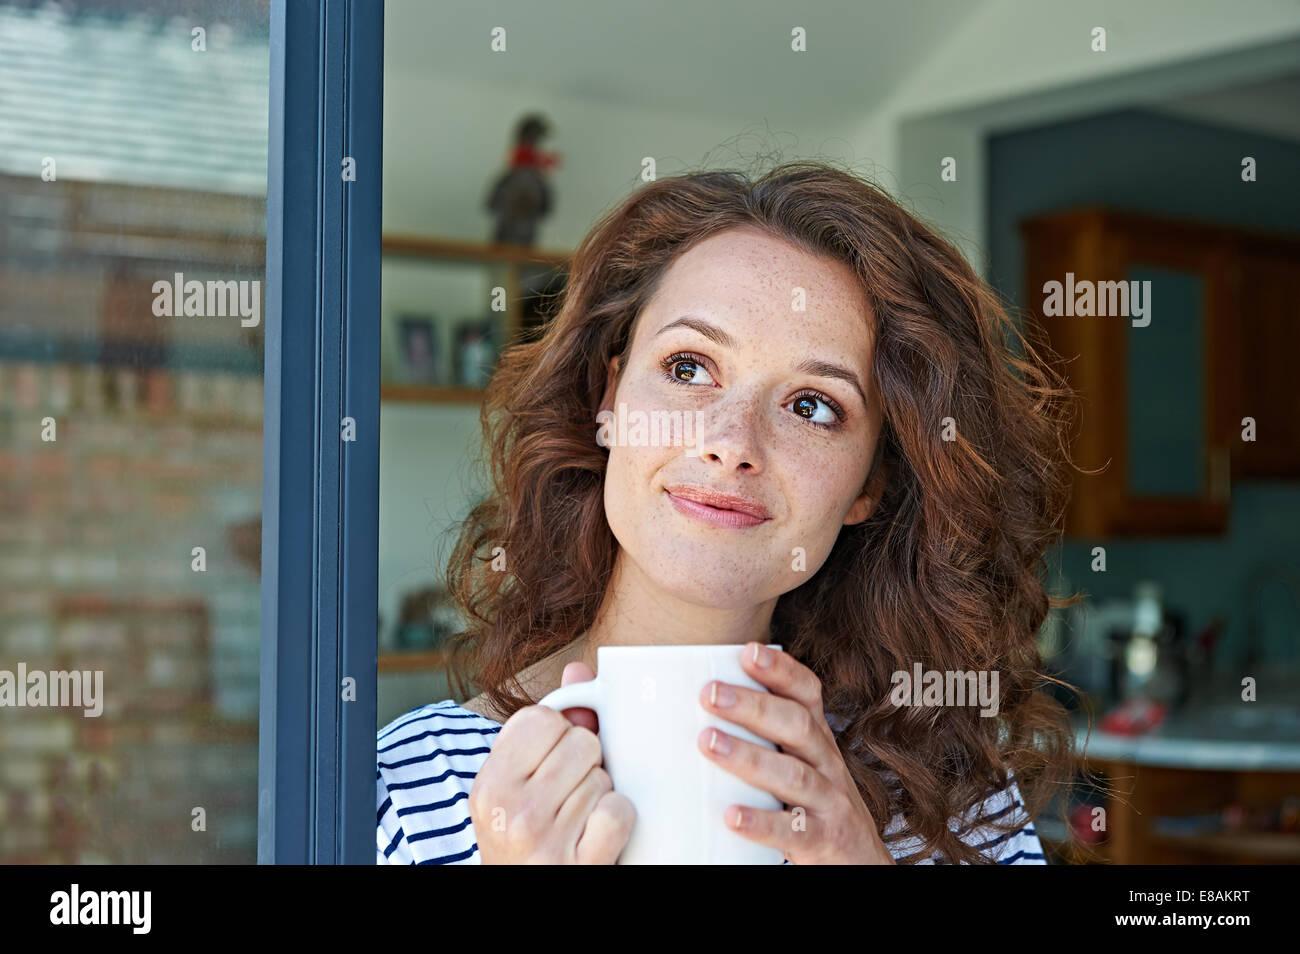 Close up of woman with mug - Stock Image